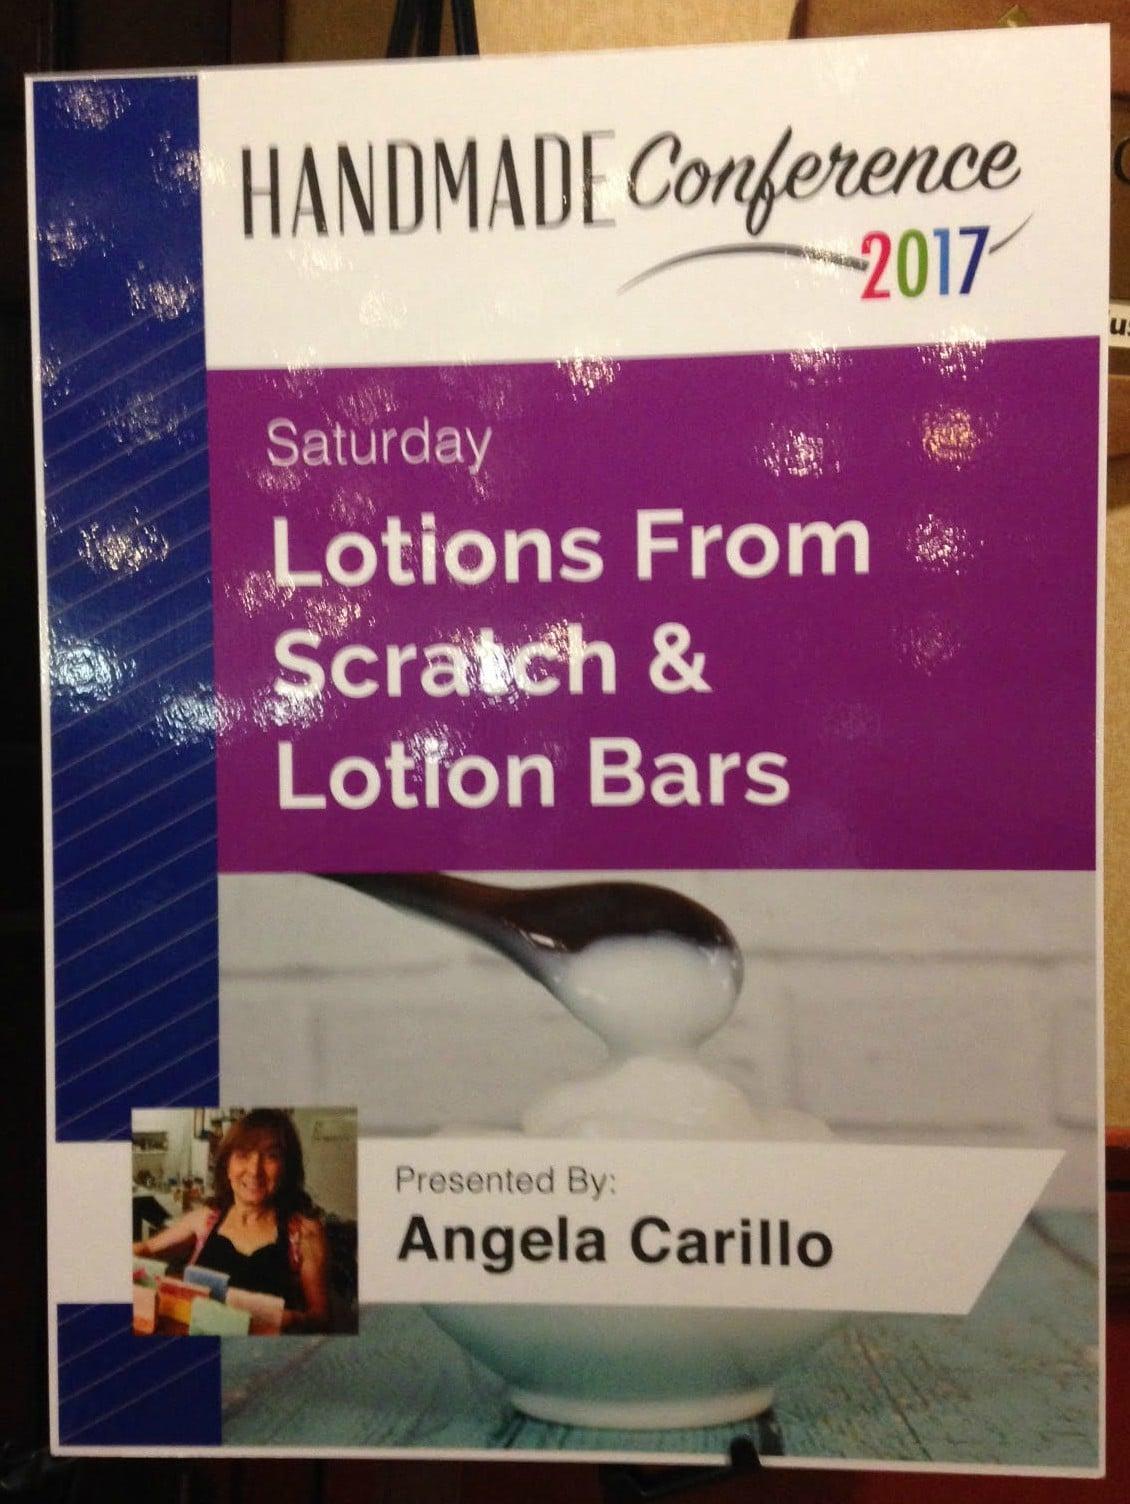 Handmade Conference June 2017